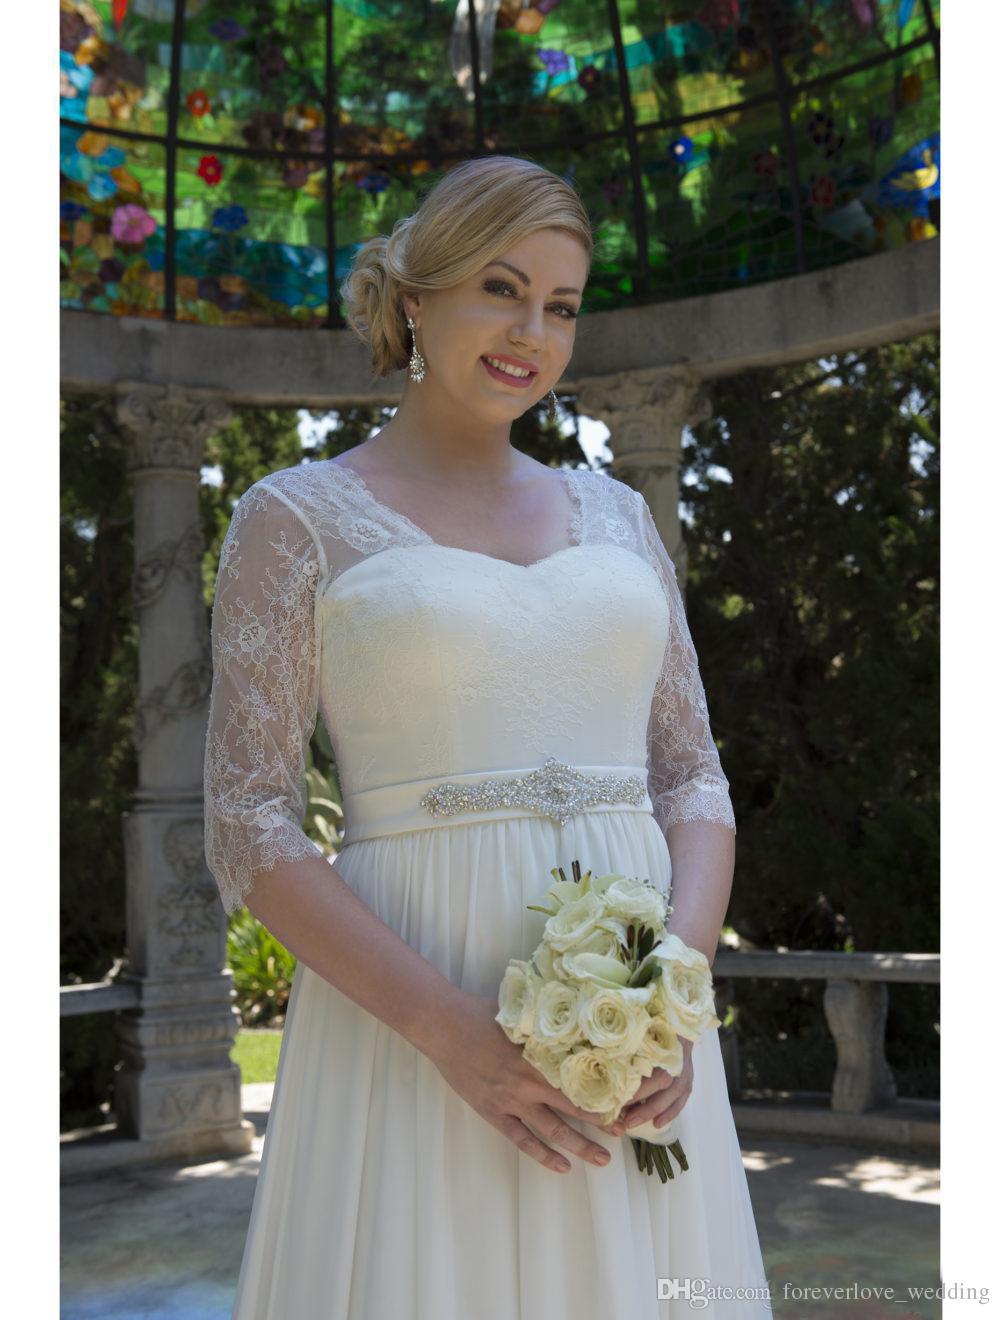 Cheap Country Style Half Sleeve Wedding Dresses 2018 Sexy Backless A-Line Beaded Sash Sweep Train Chiffon Boho Beach Wedding Bridal Gowns